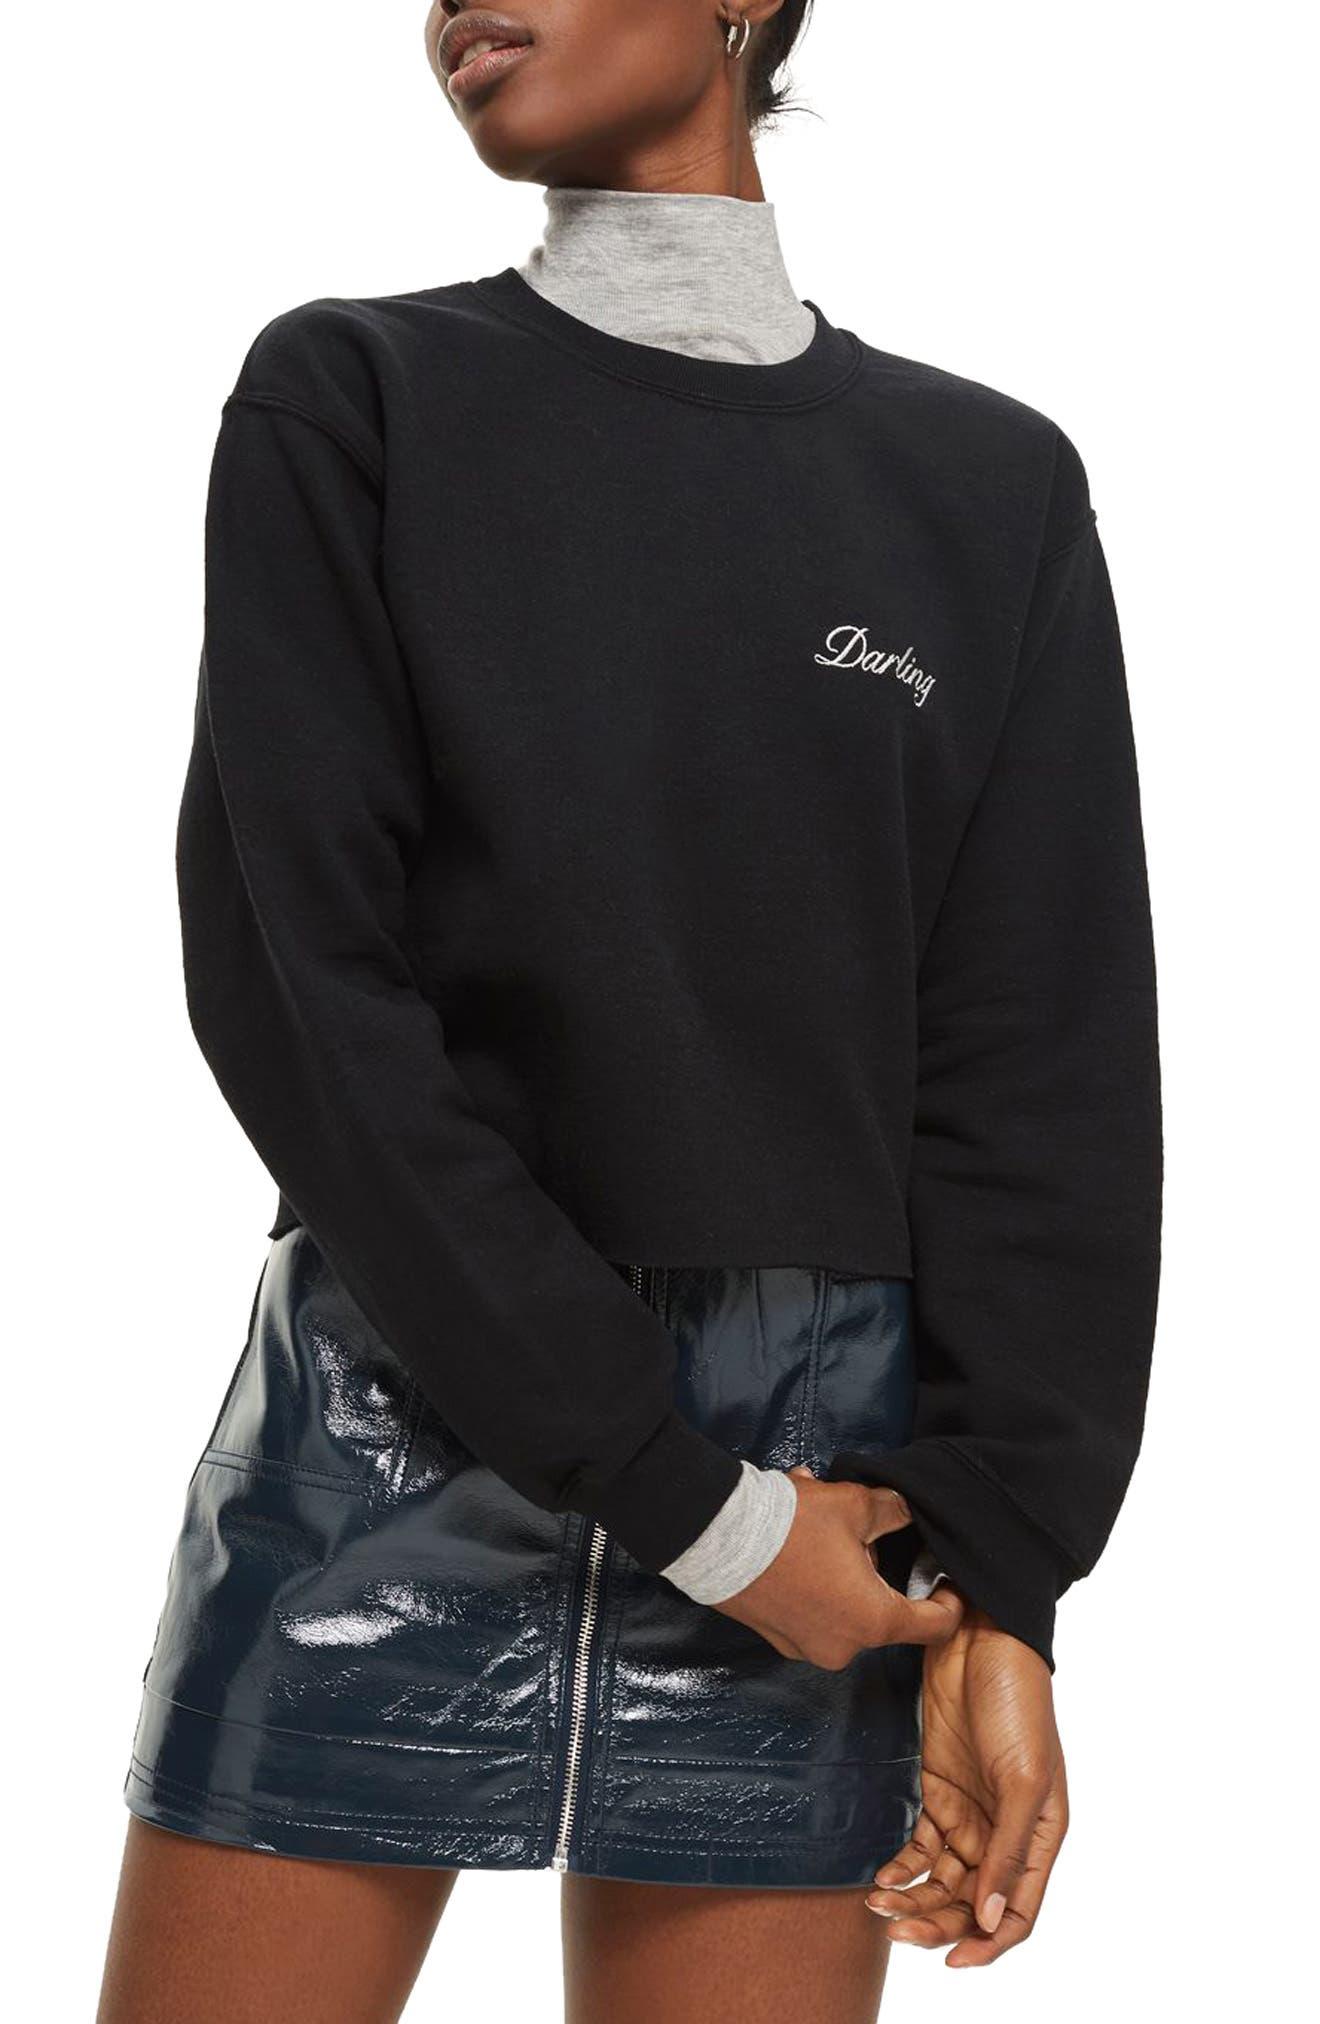 Darling Slogan Crop Sweatshirt,                             Main thumbnail 1, color,